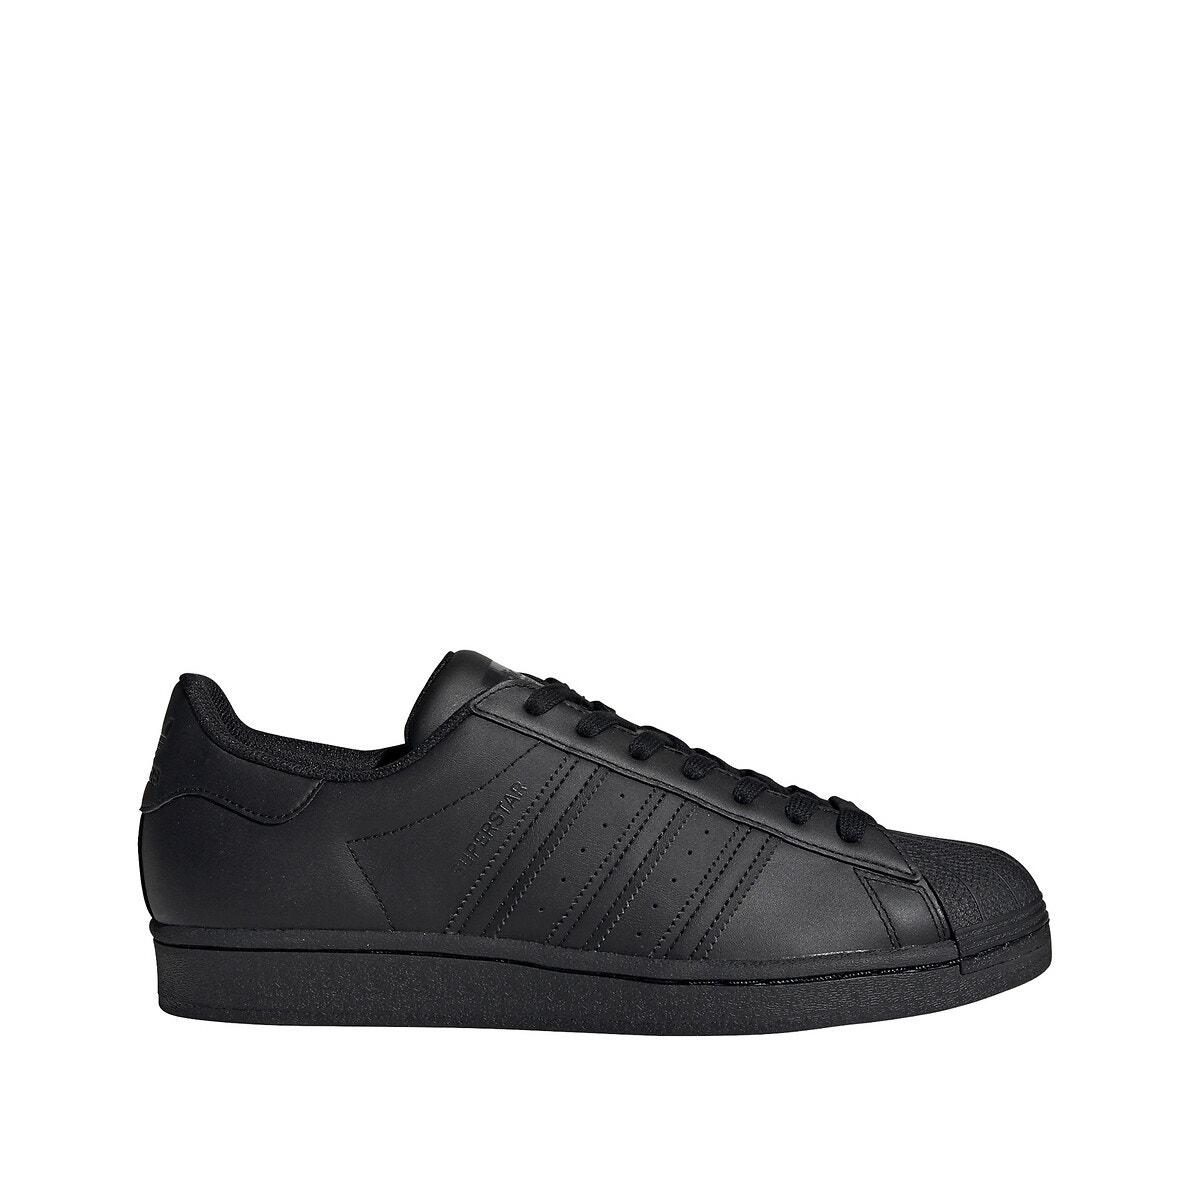 Adidas superstar noir homme   La Redoute